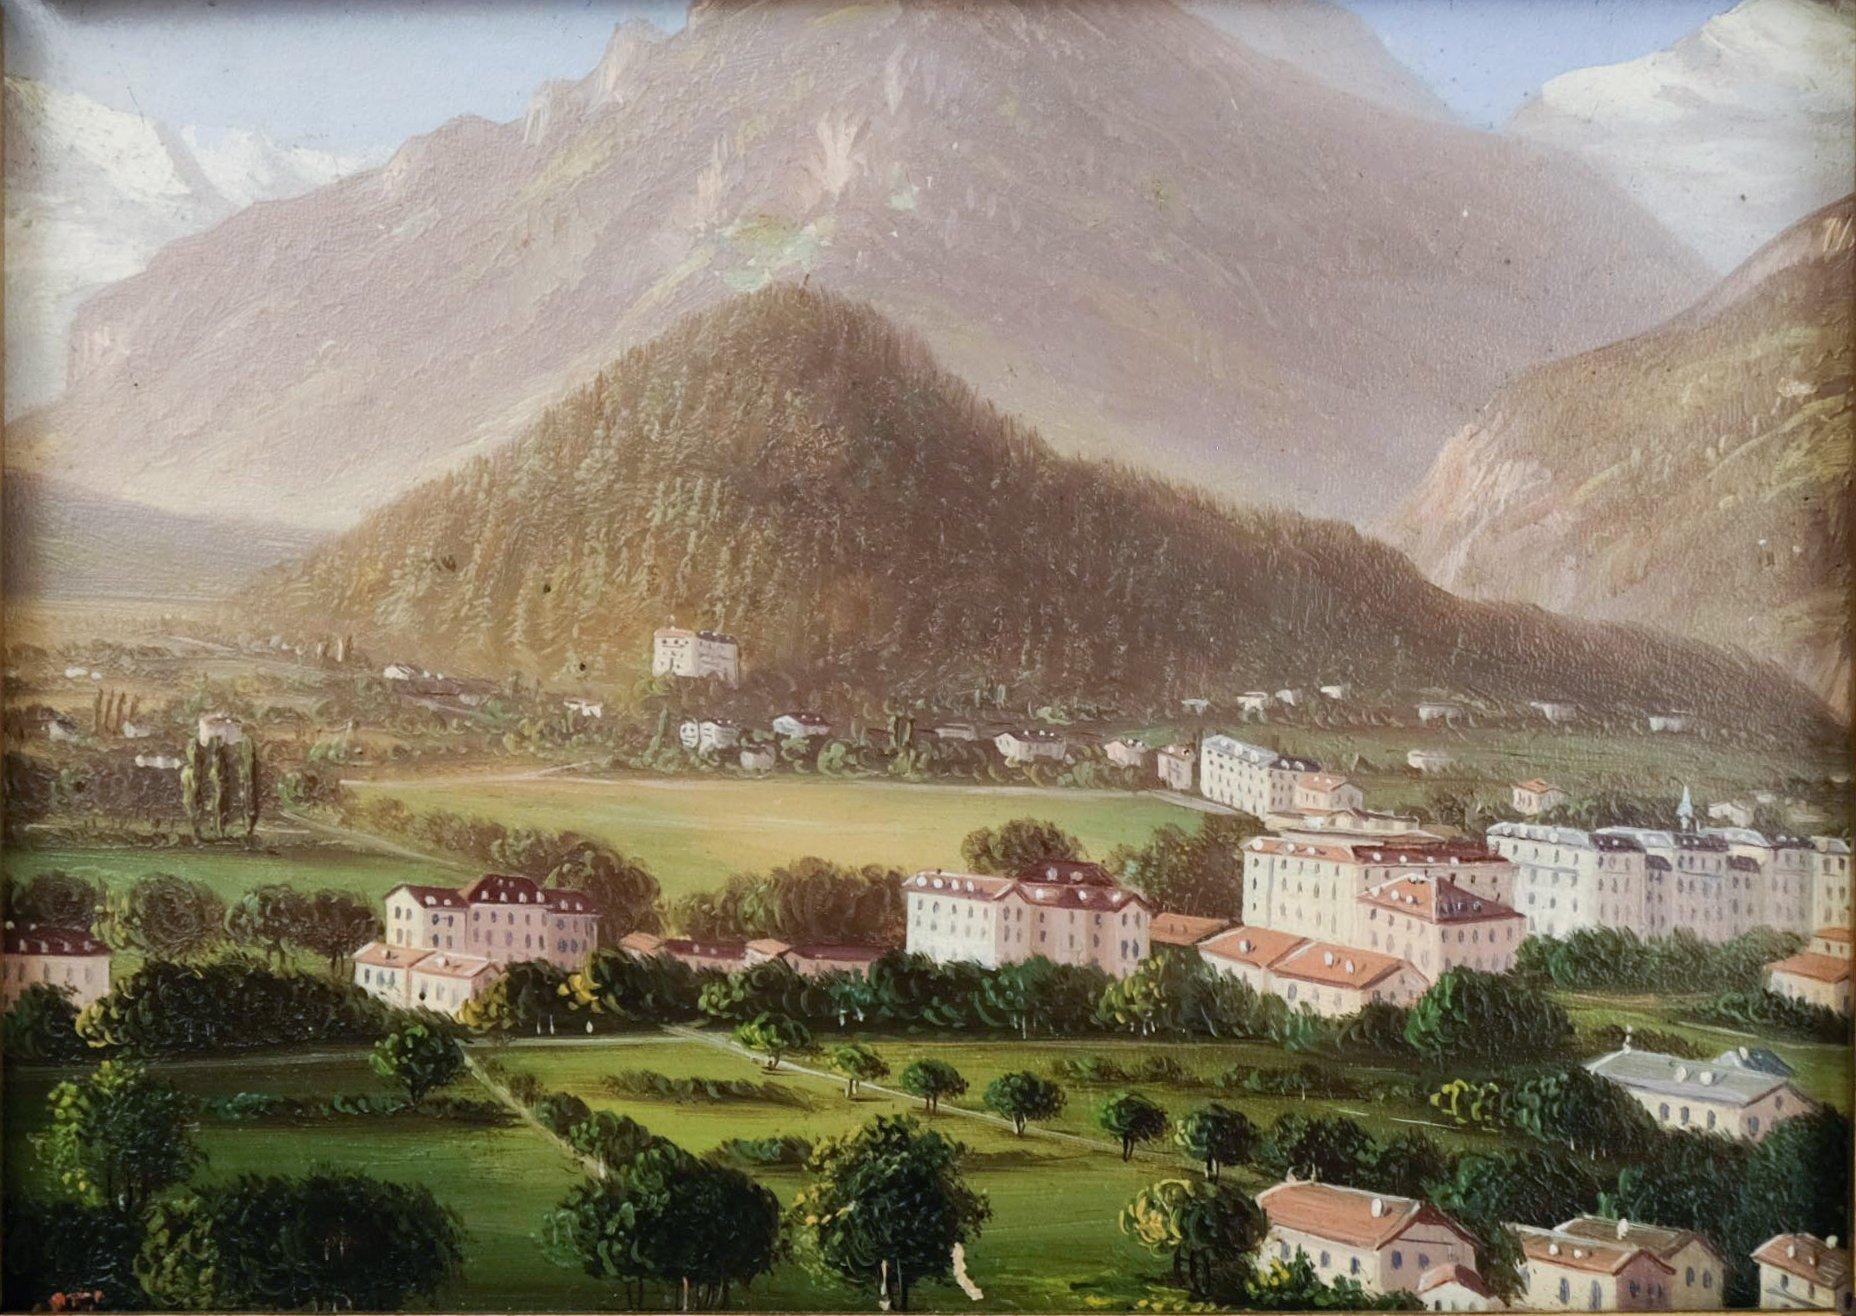 Hubert Sattler - Louis Ritschard (1817-1904) - Interlaken